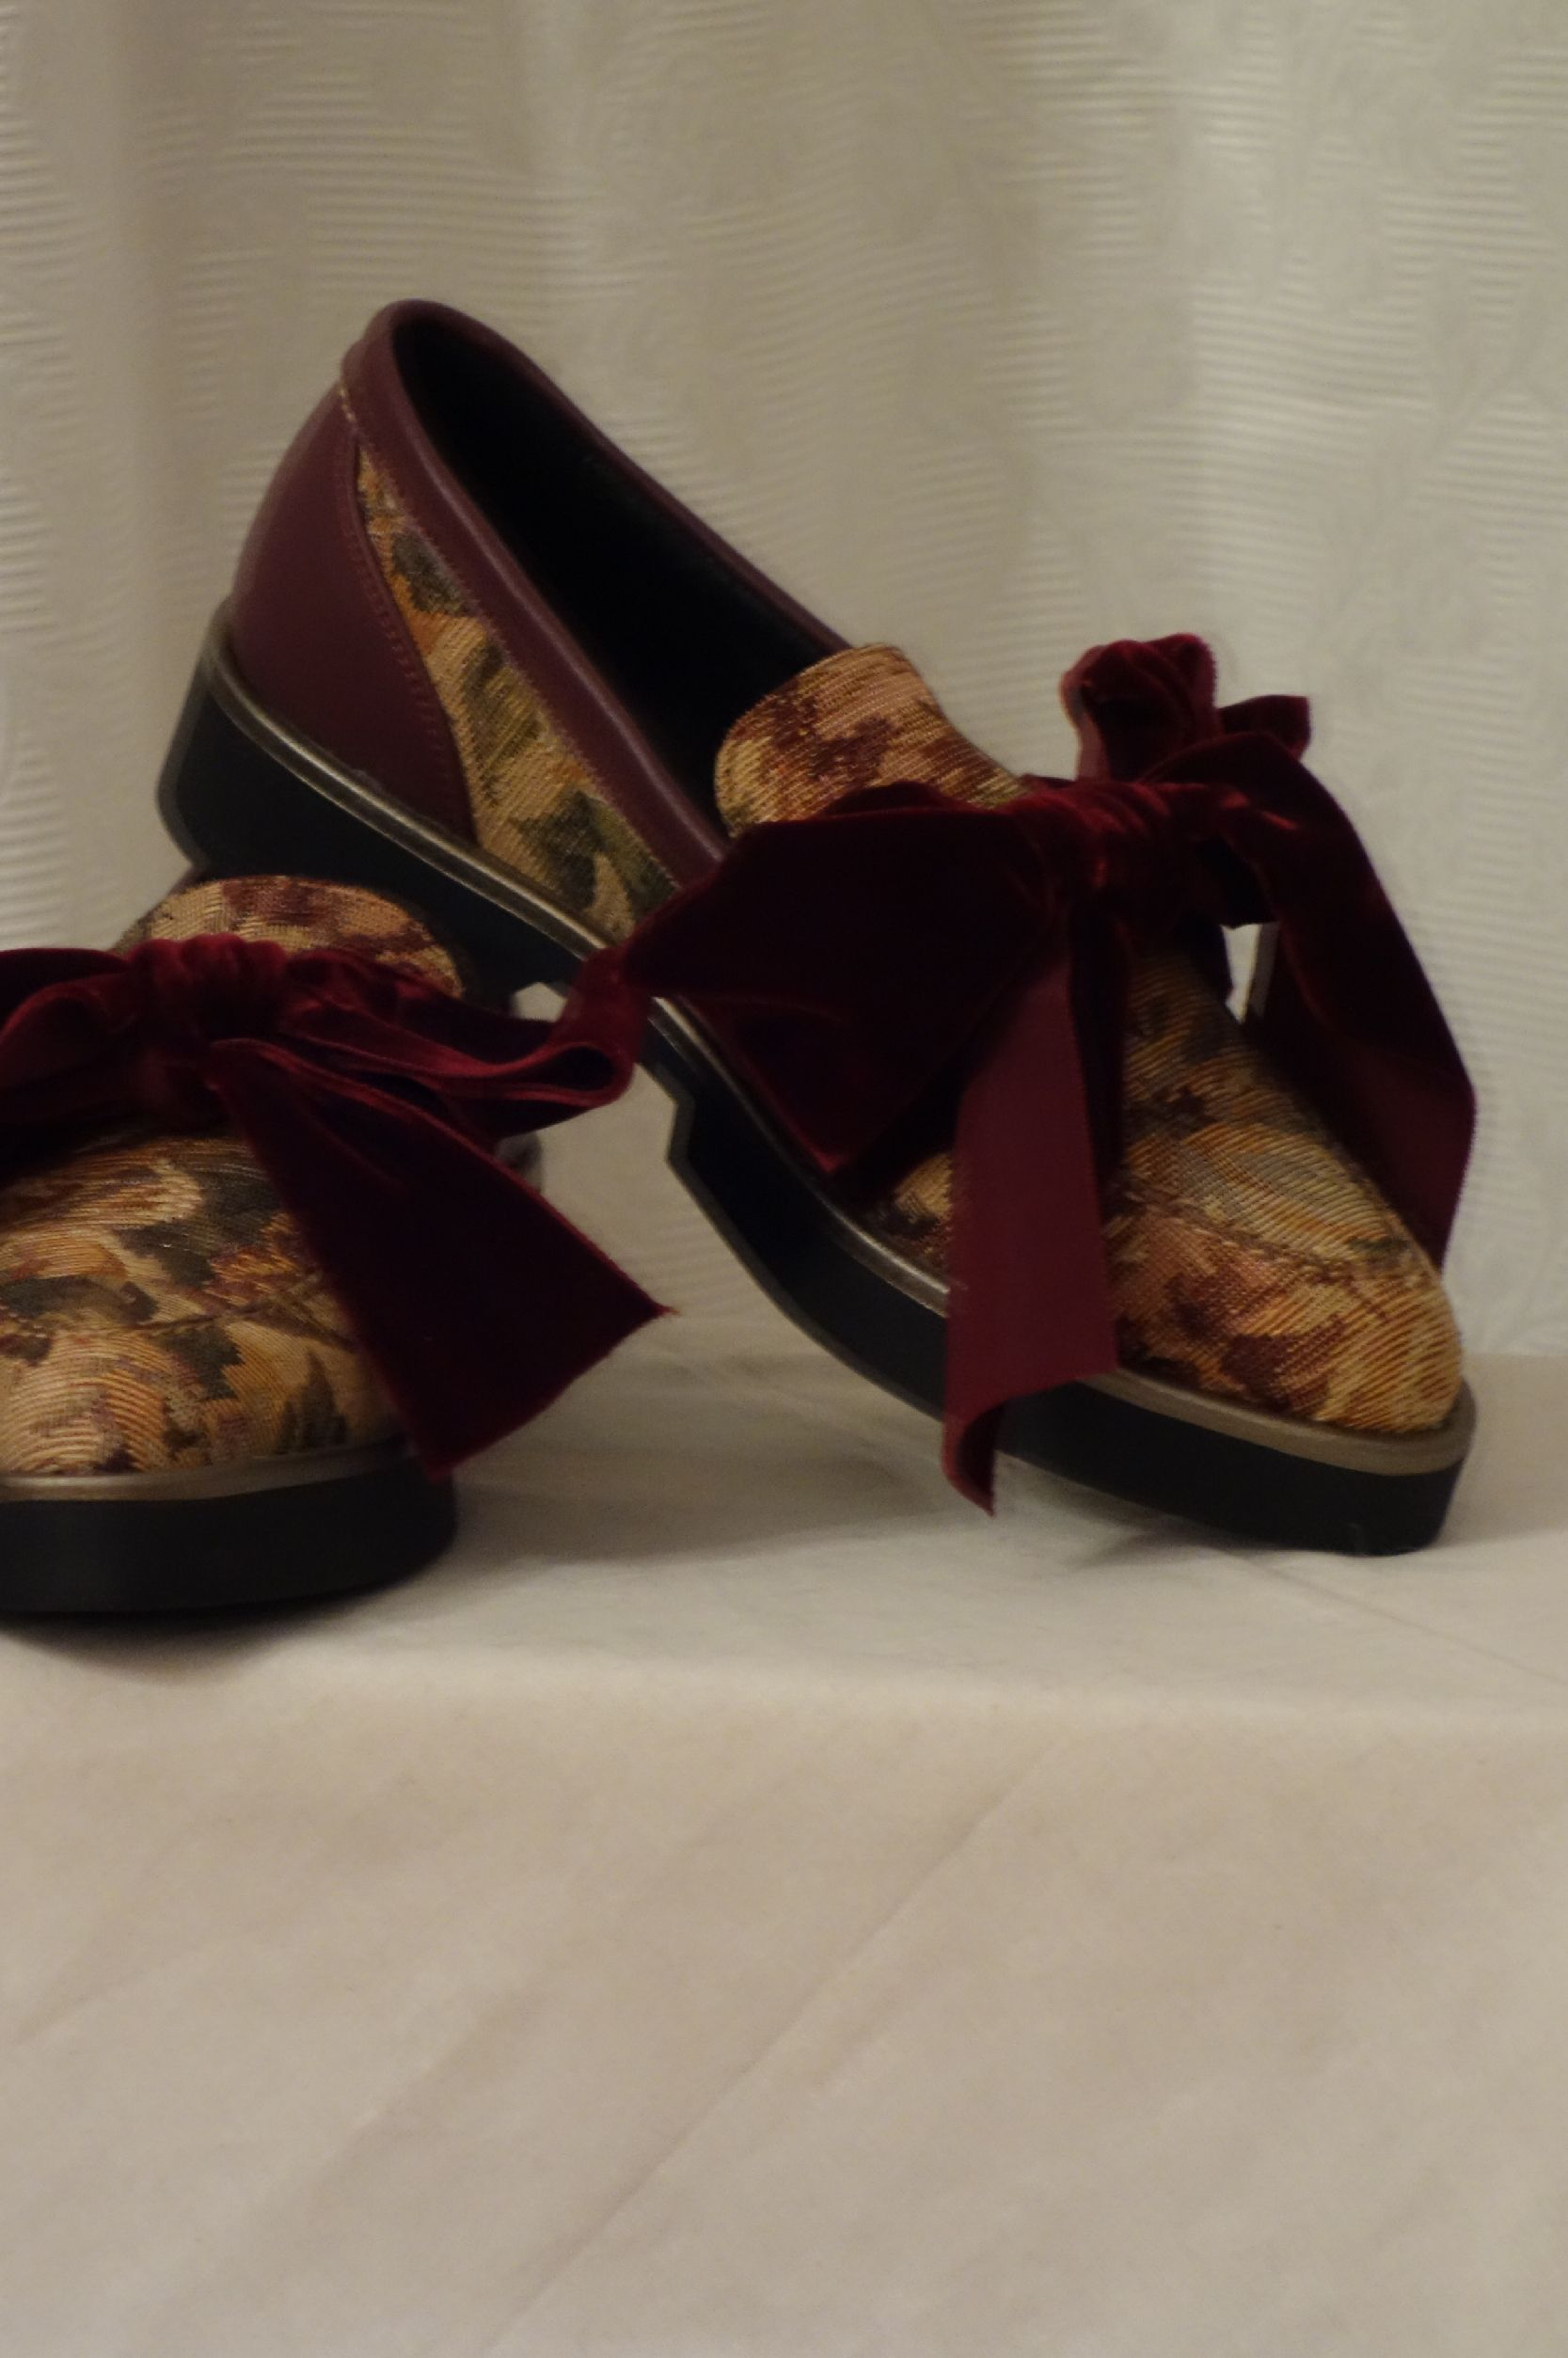 Chaussures - Bas-tops Et Baskets Kontessa SkmQkVflwk